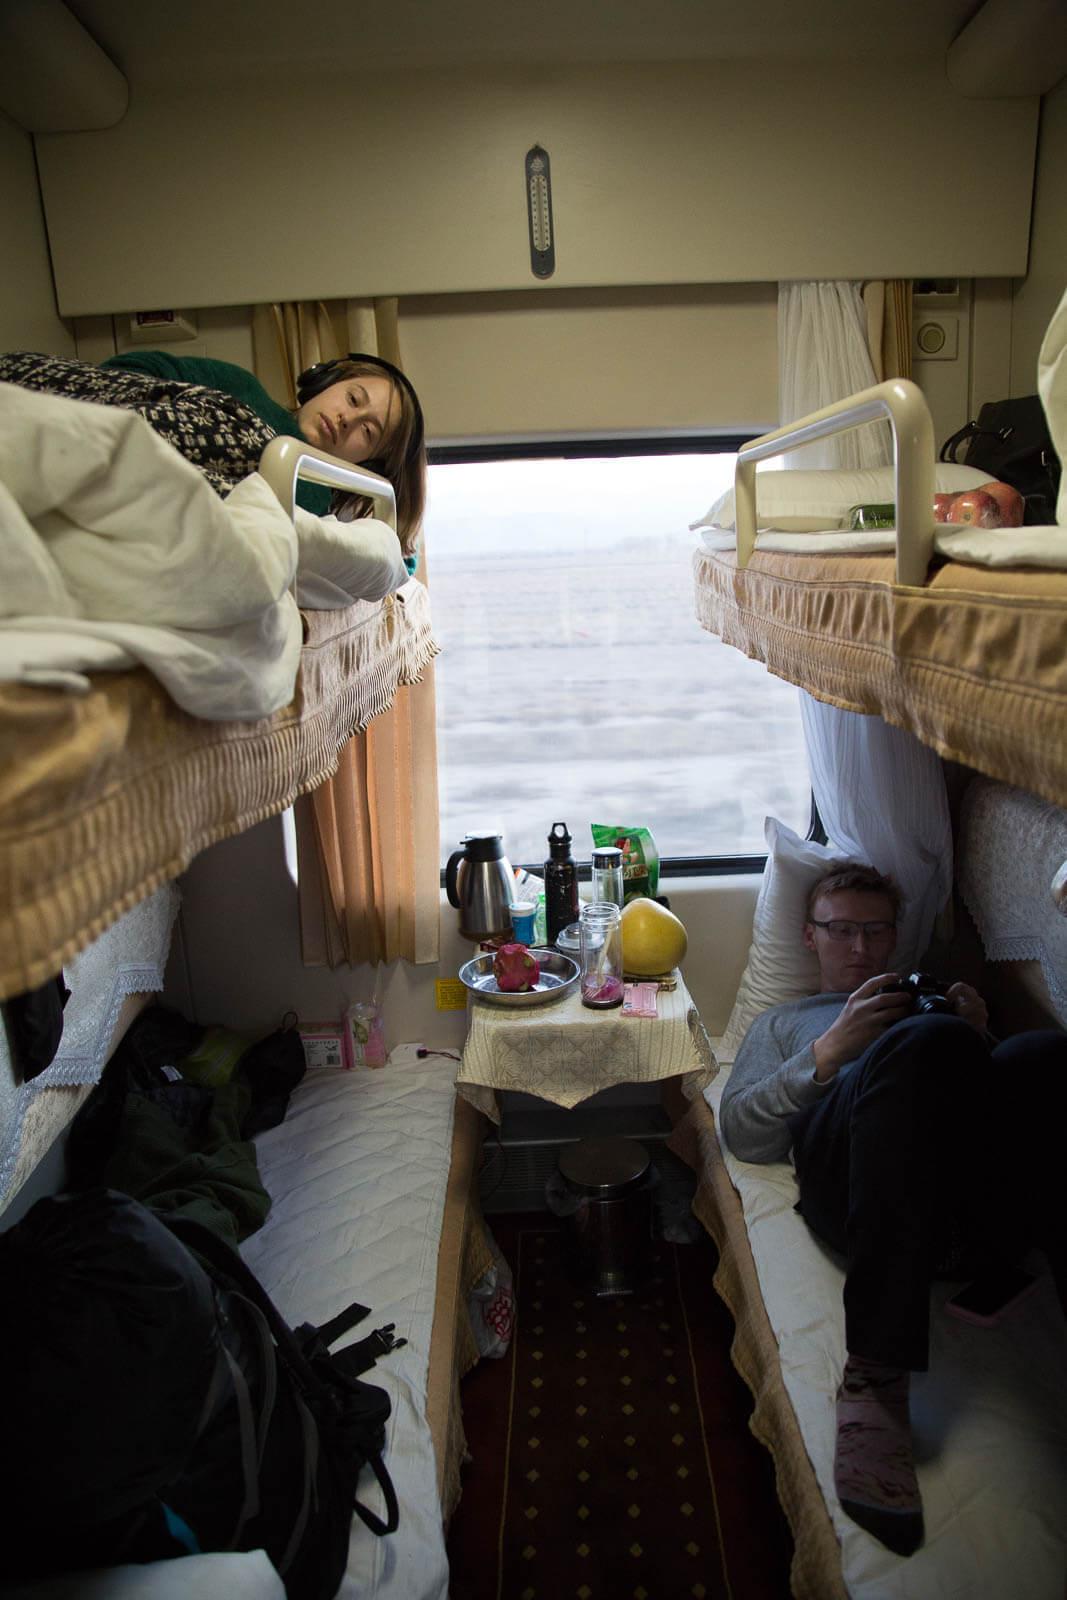 tibet train ride-2131